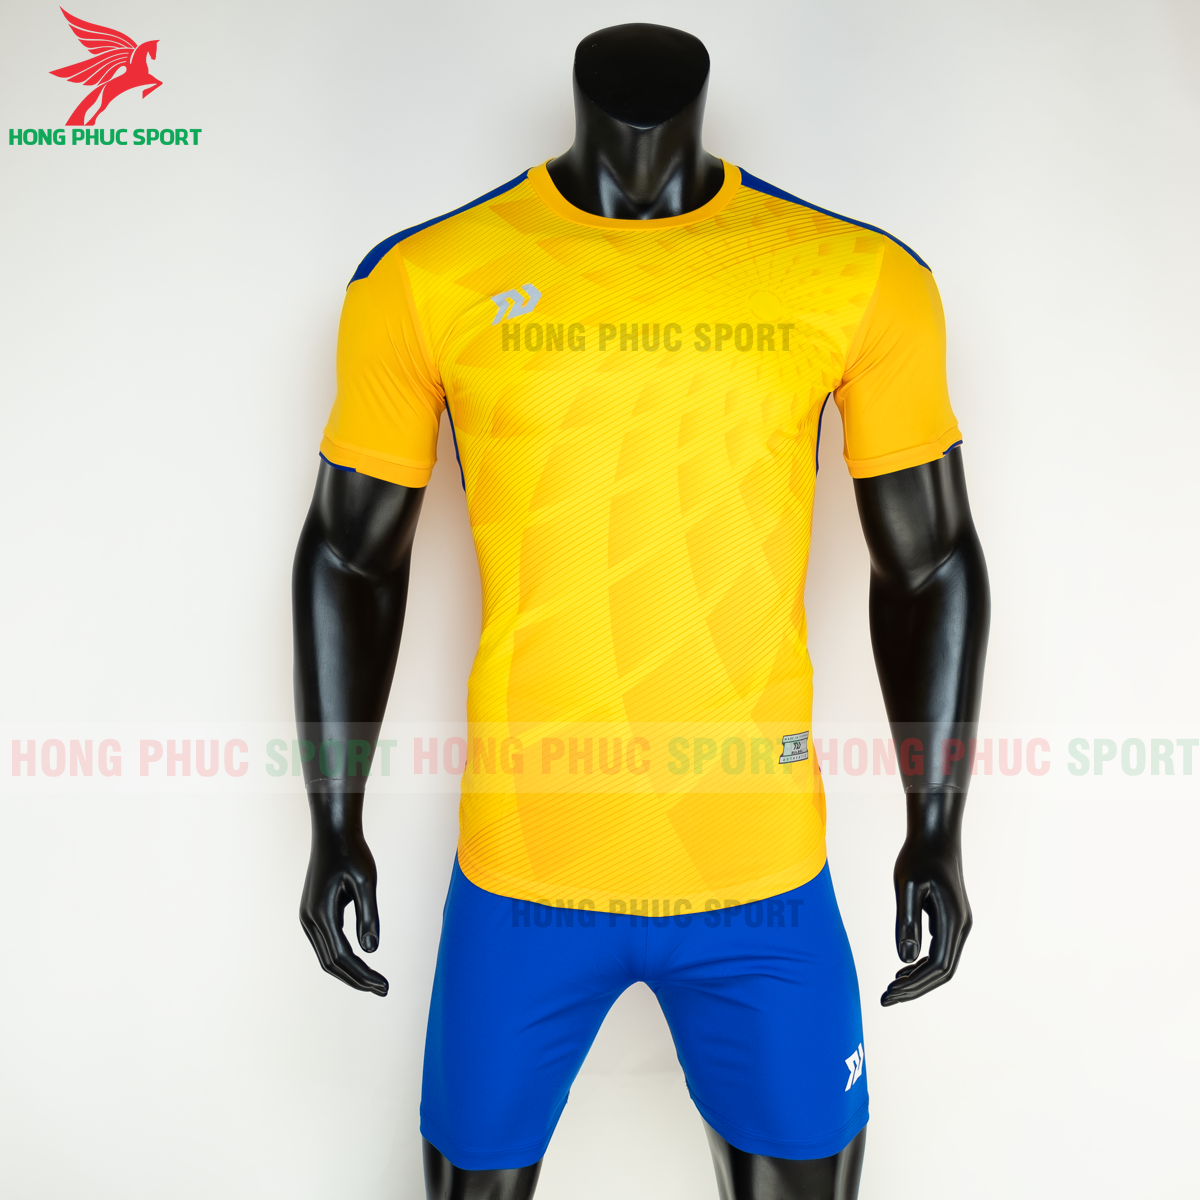 https://cdn.hongphucsport.com/unsafe/s4.shopbay.vn/files/285/ao-bong-da-khong-logo-bulbal-lotus-mau-vang-2-60500eef10229.png